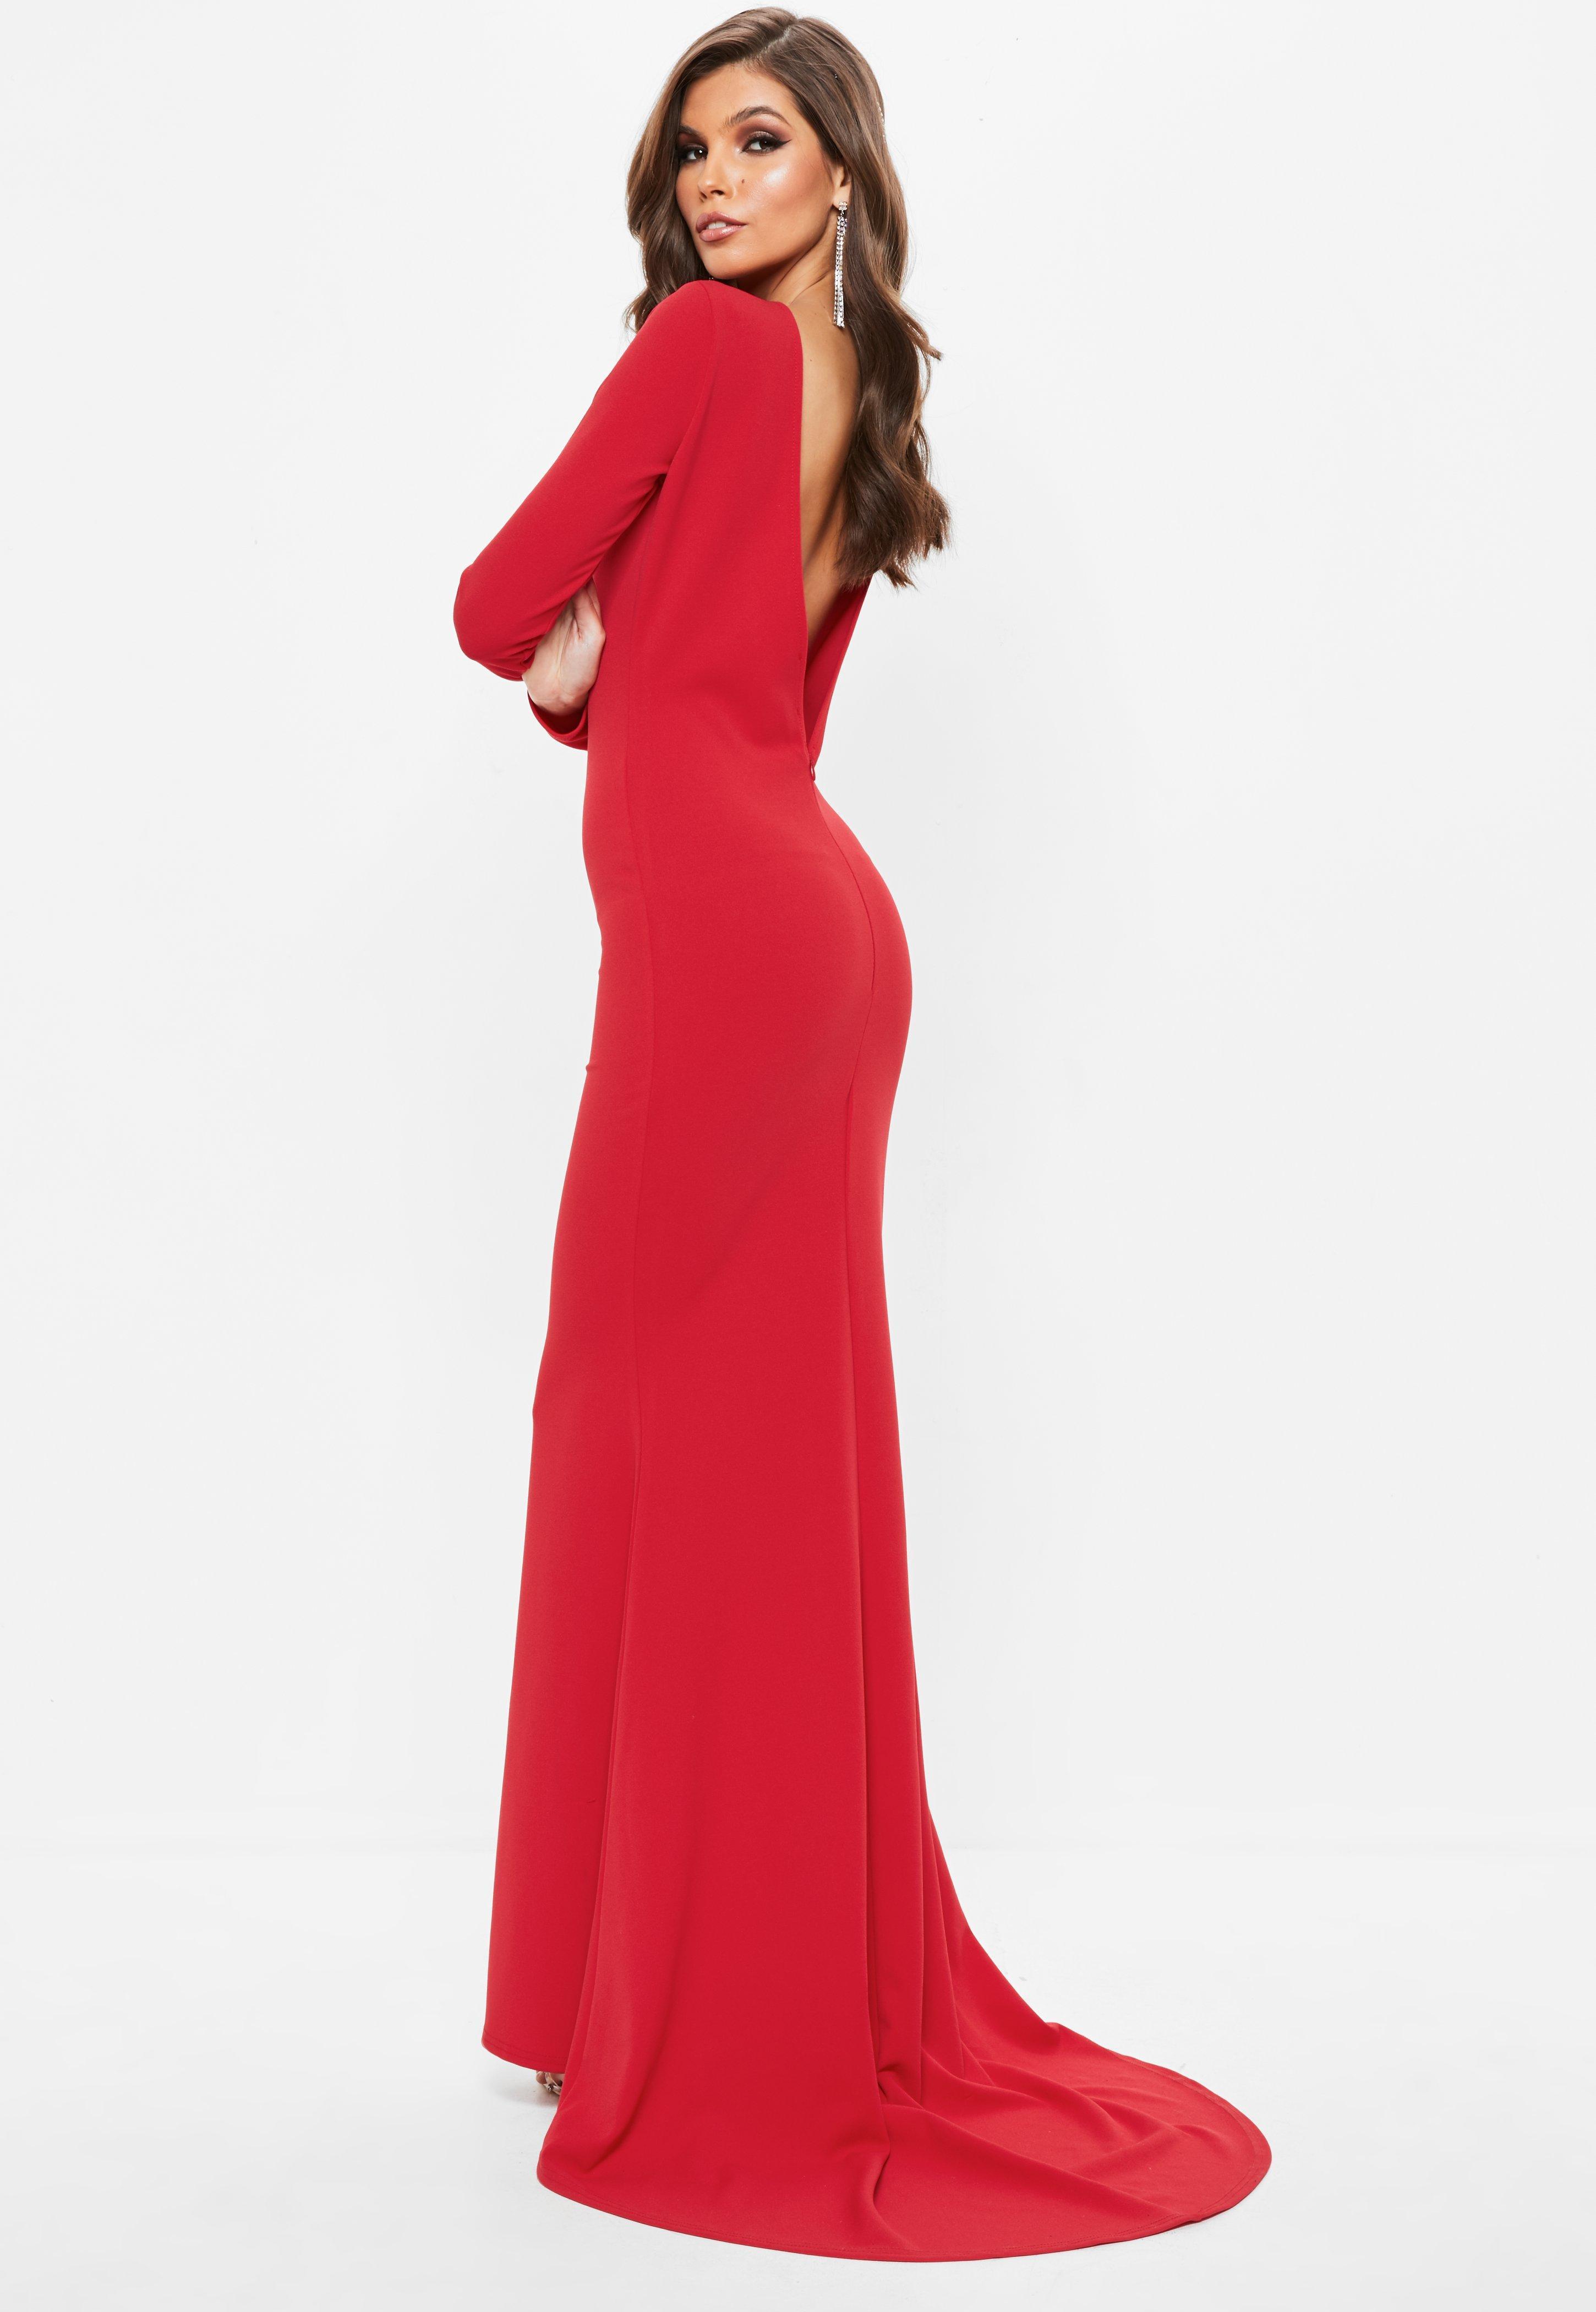 Robe longue rouge à traîne